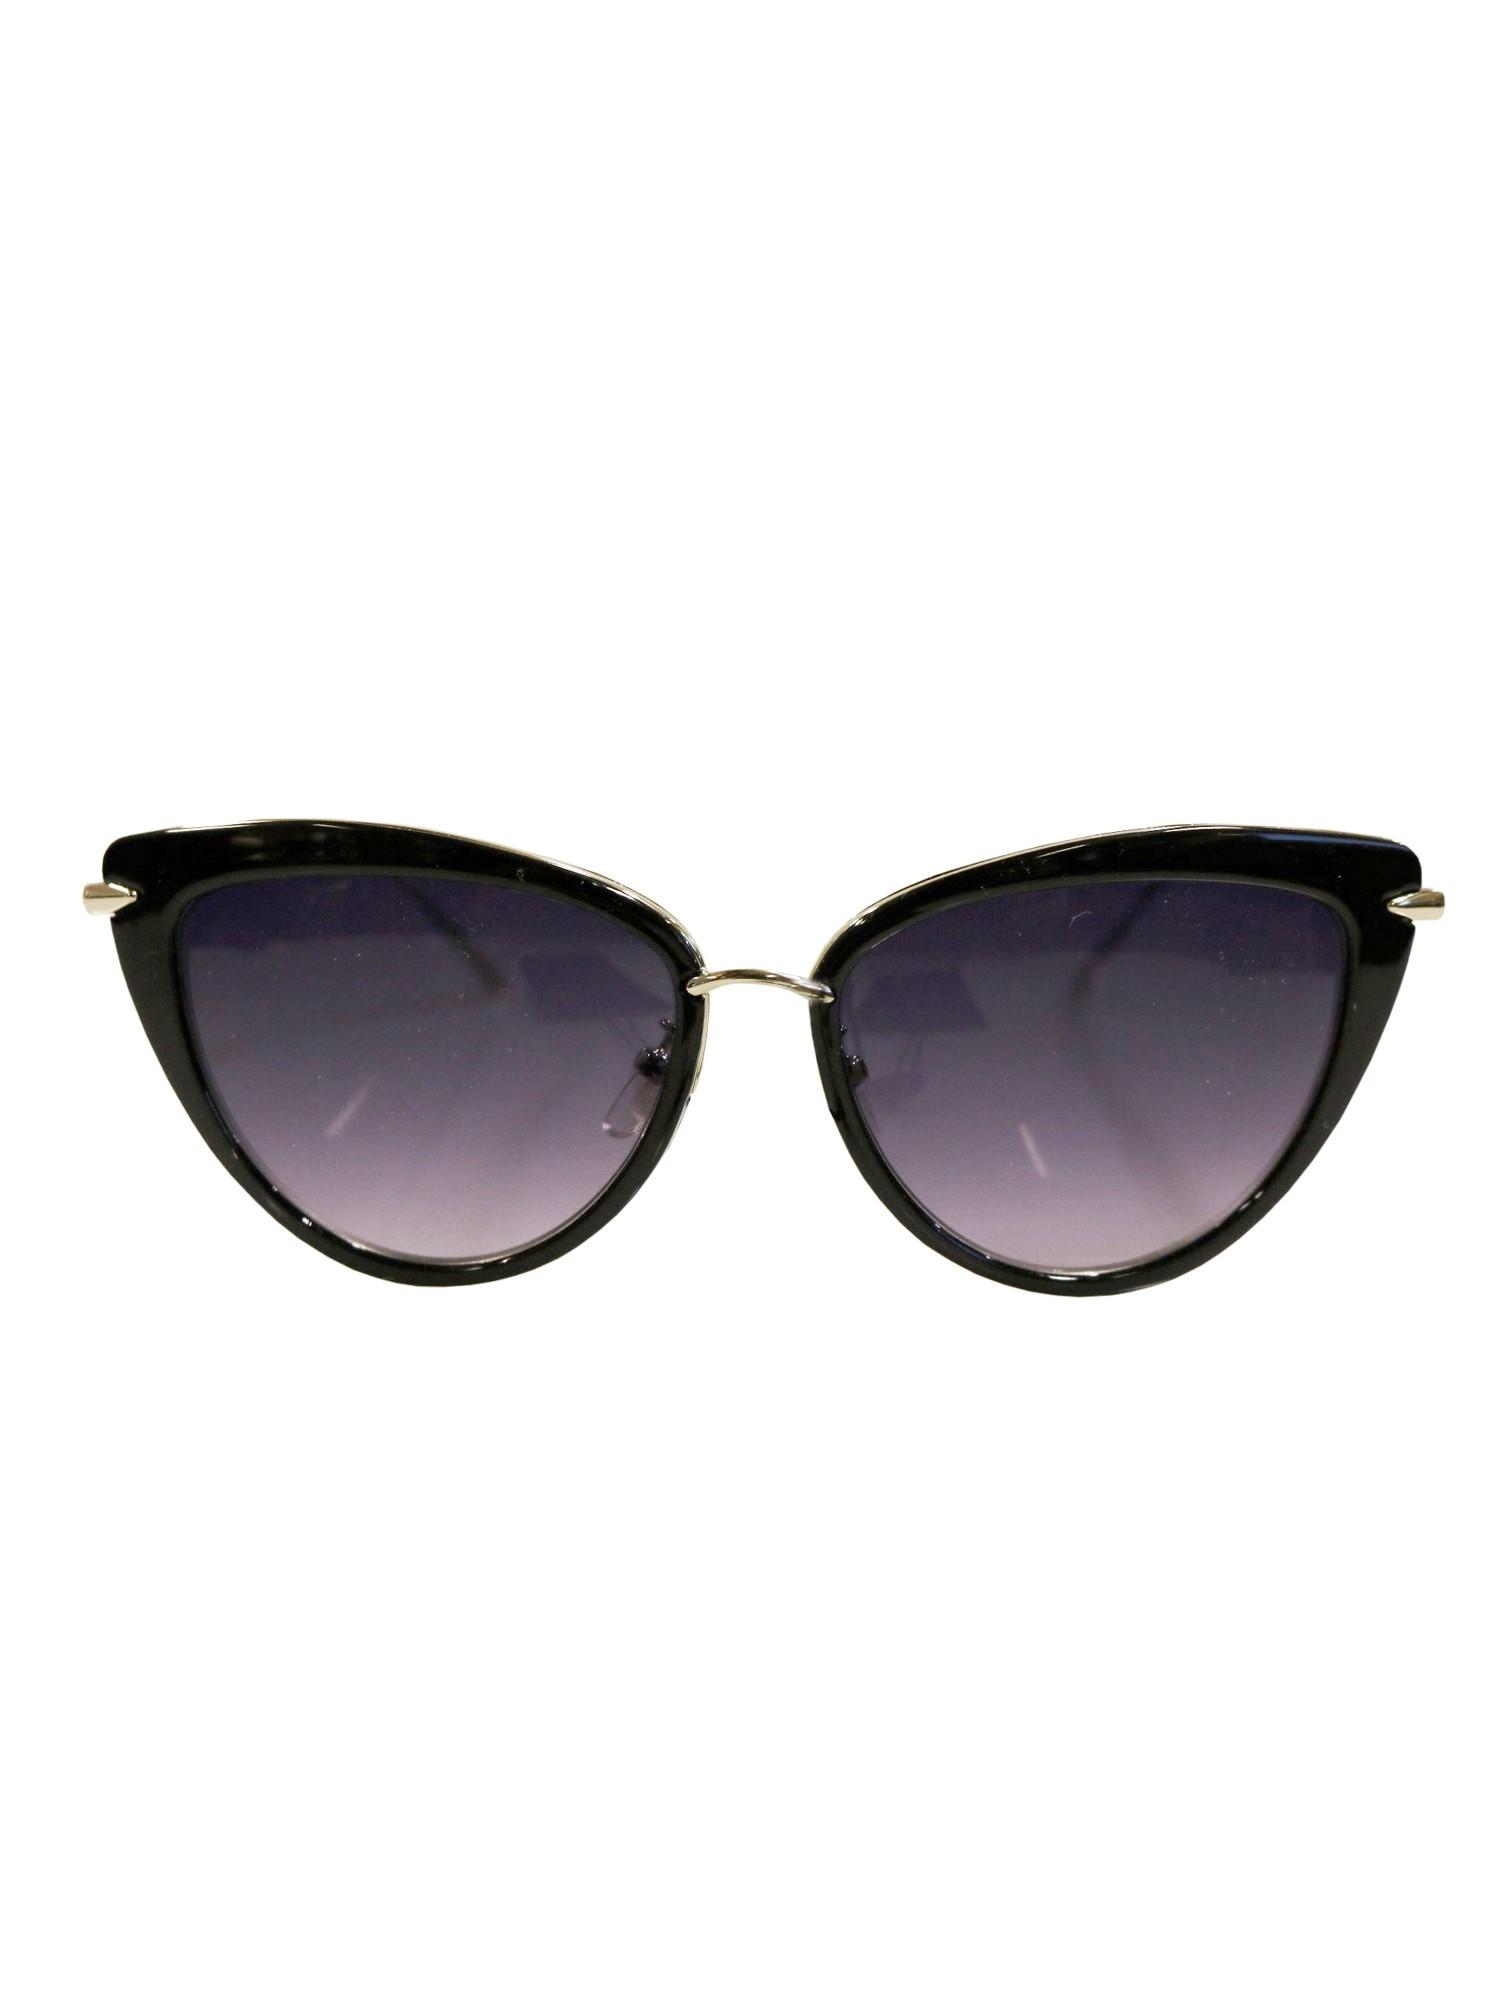 50s retro cat eye sonnenbrille v collectif neuheiten. Black Bedroom Furniture Sets. Home Design Ideas